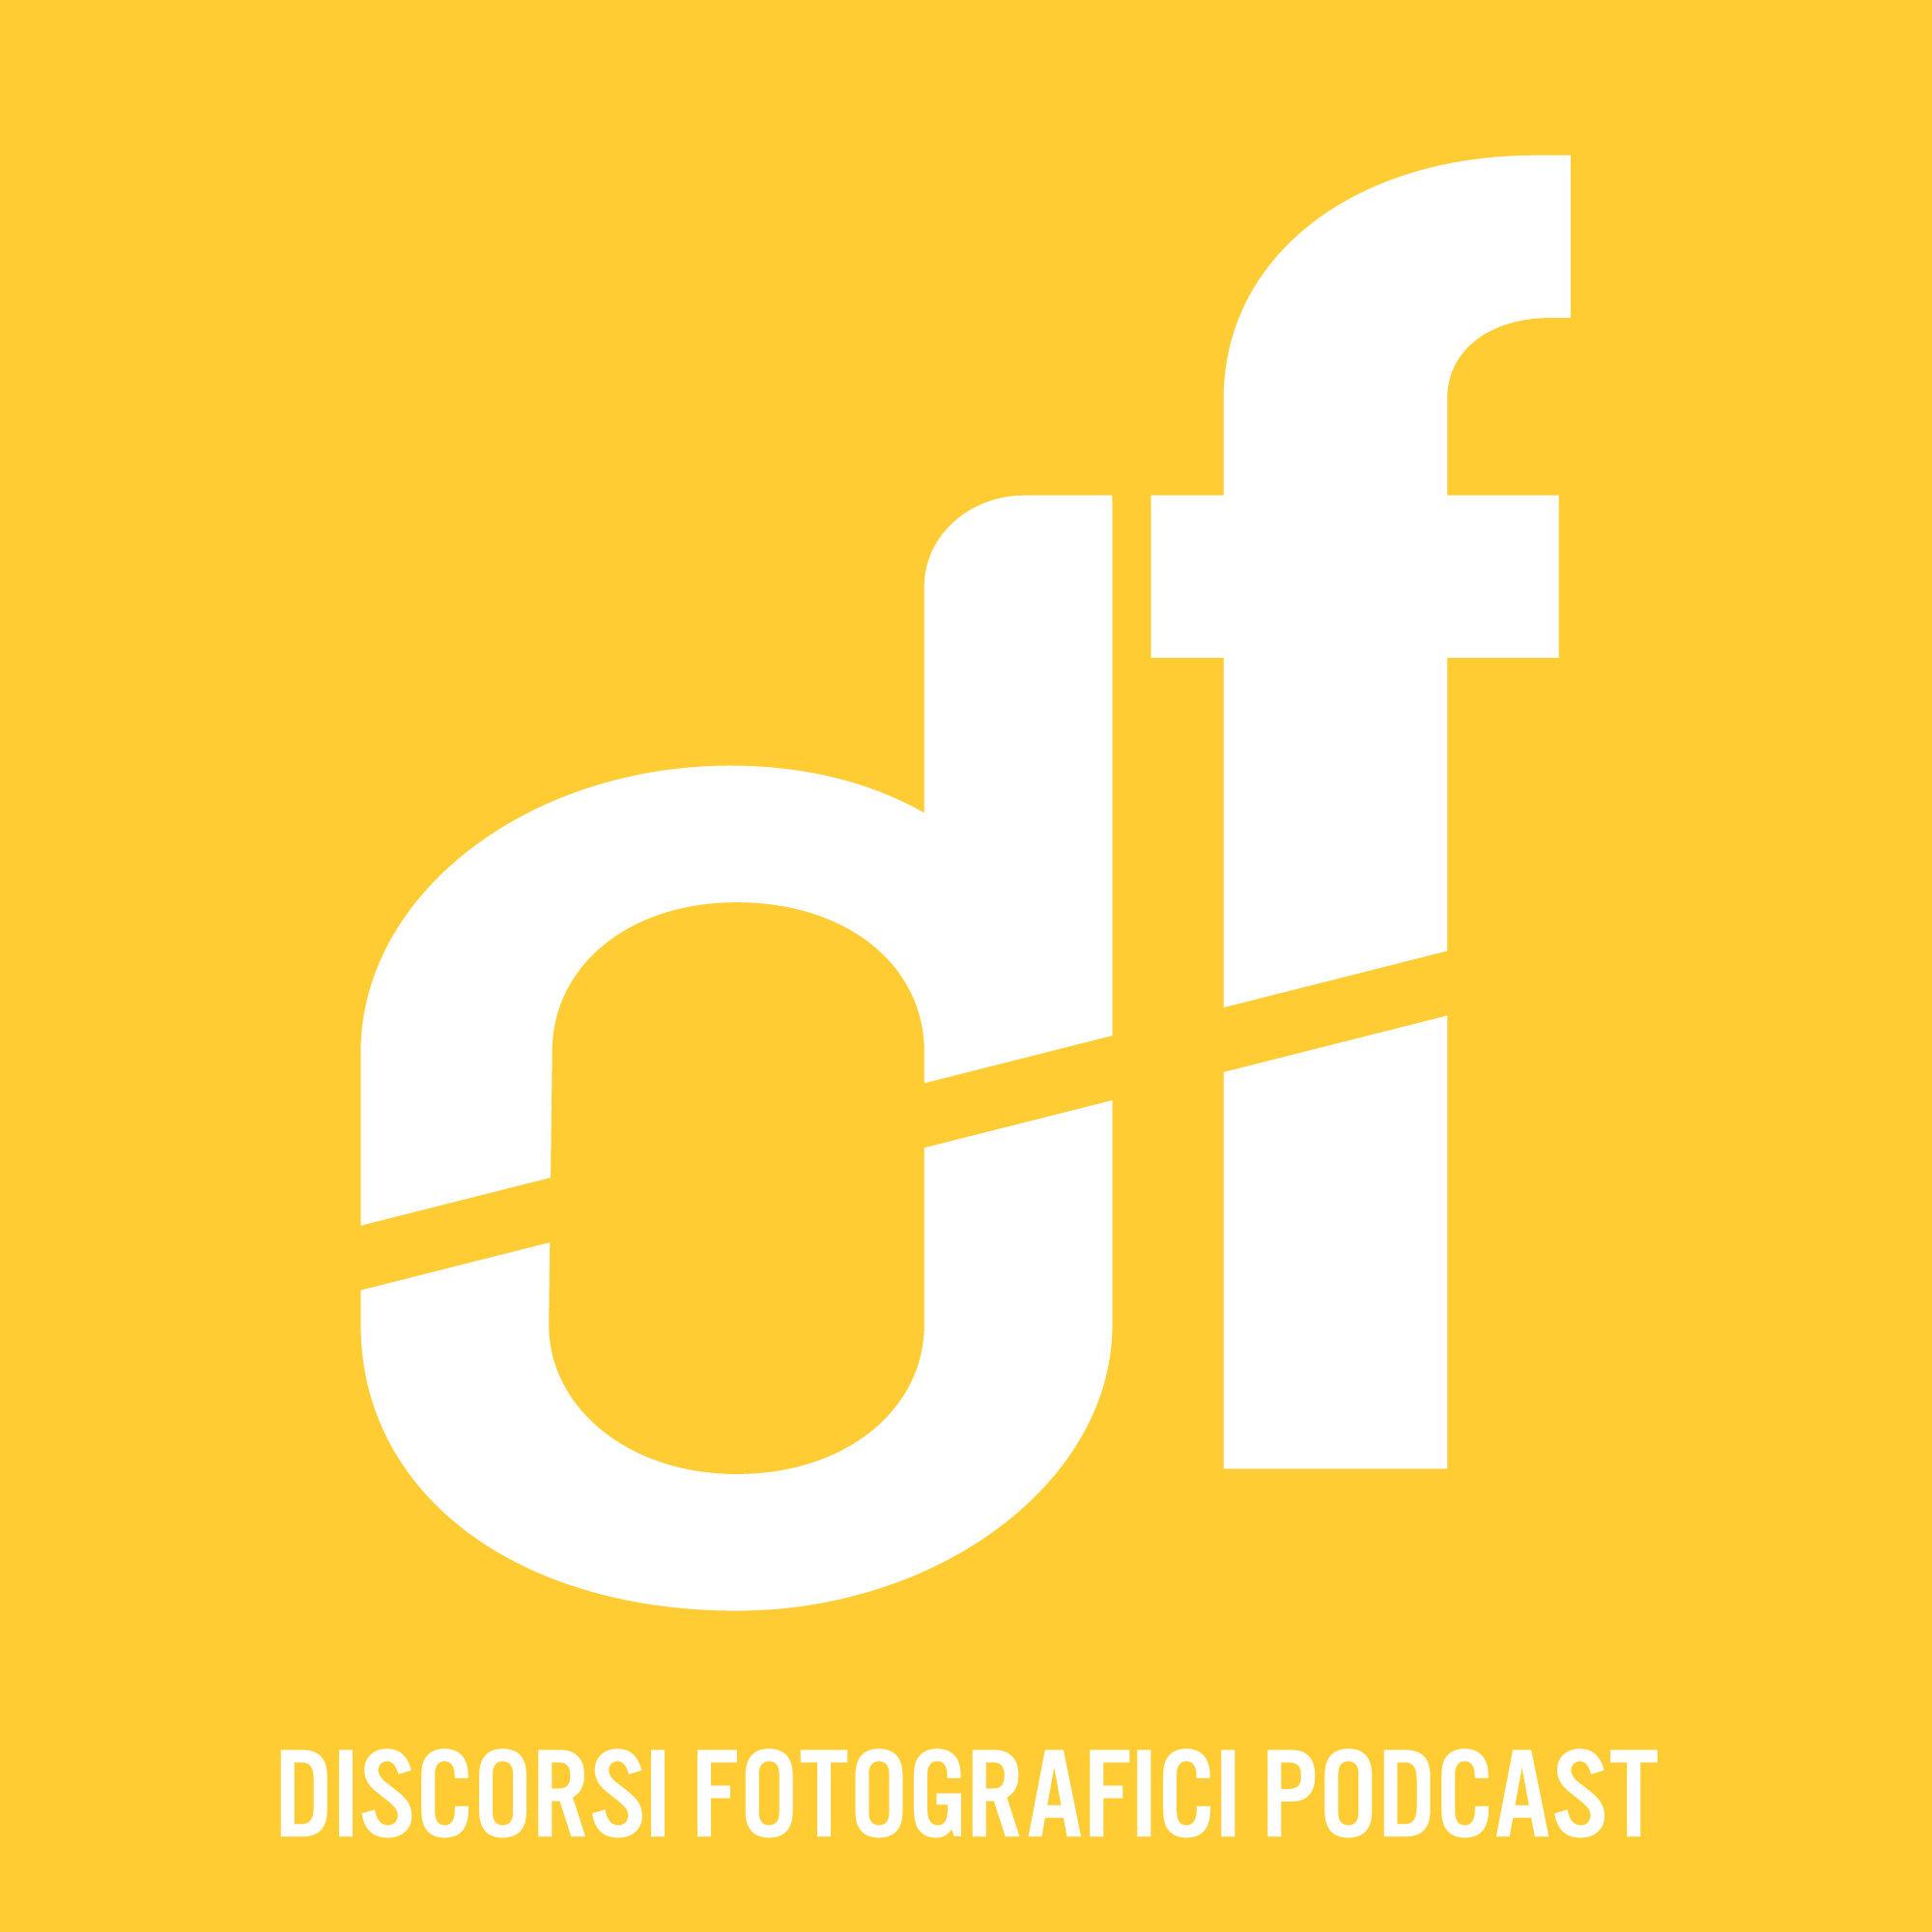 Discorsi Fotografici Podcast